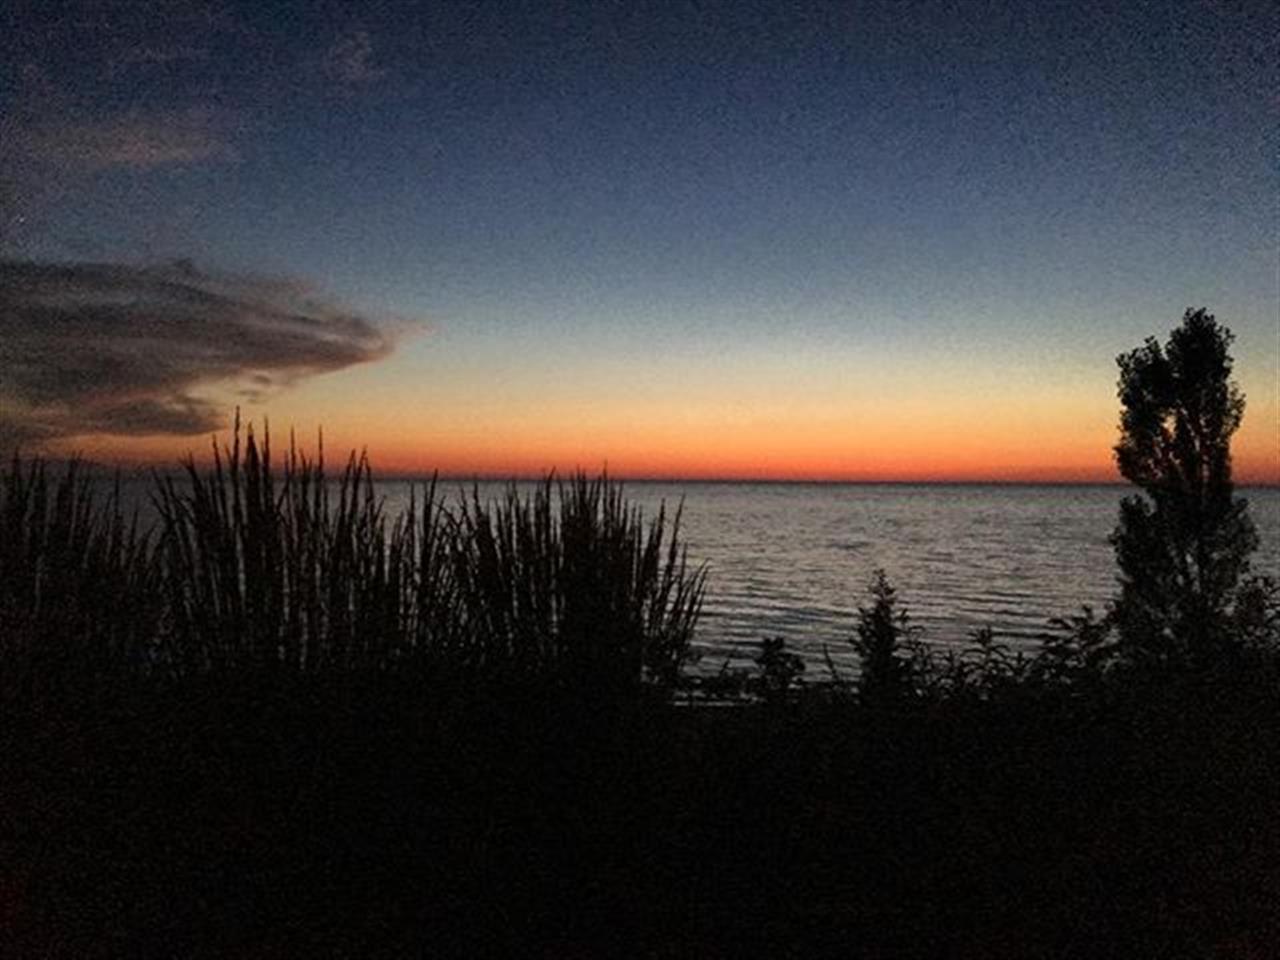 #sunset #southhaven #leadingrelocal #puremichigan #bairdwarner